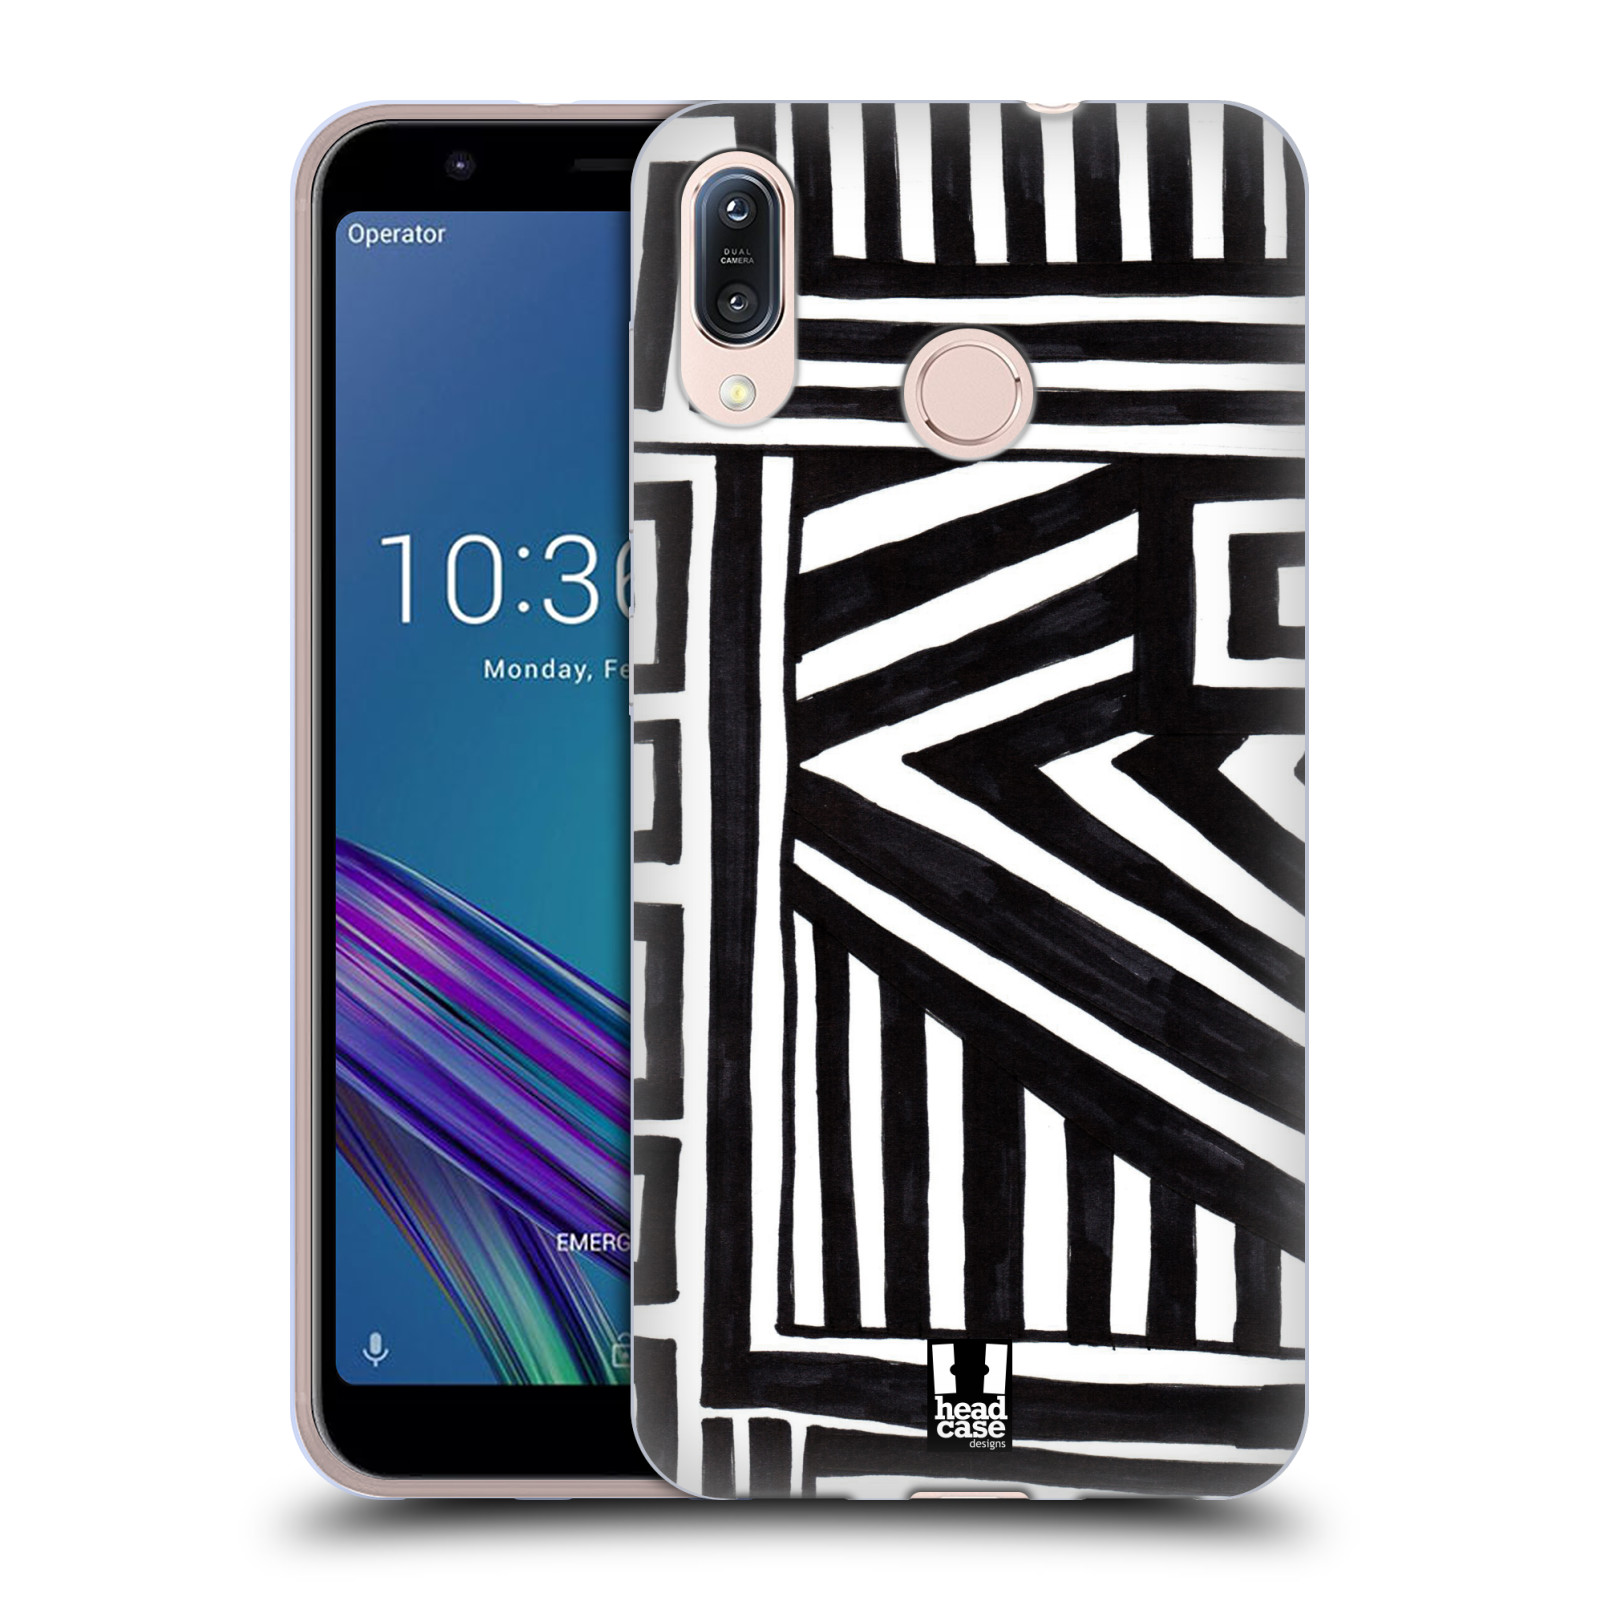 Silikonové pouzdro na mobil Asus Zenfone Max M1 ZB555KL - Head Case - DOODLE GEOMETRIC